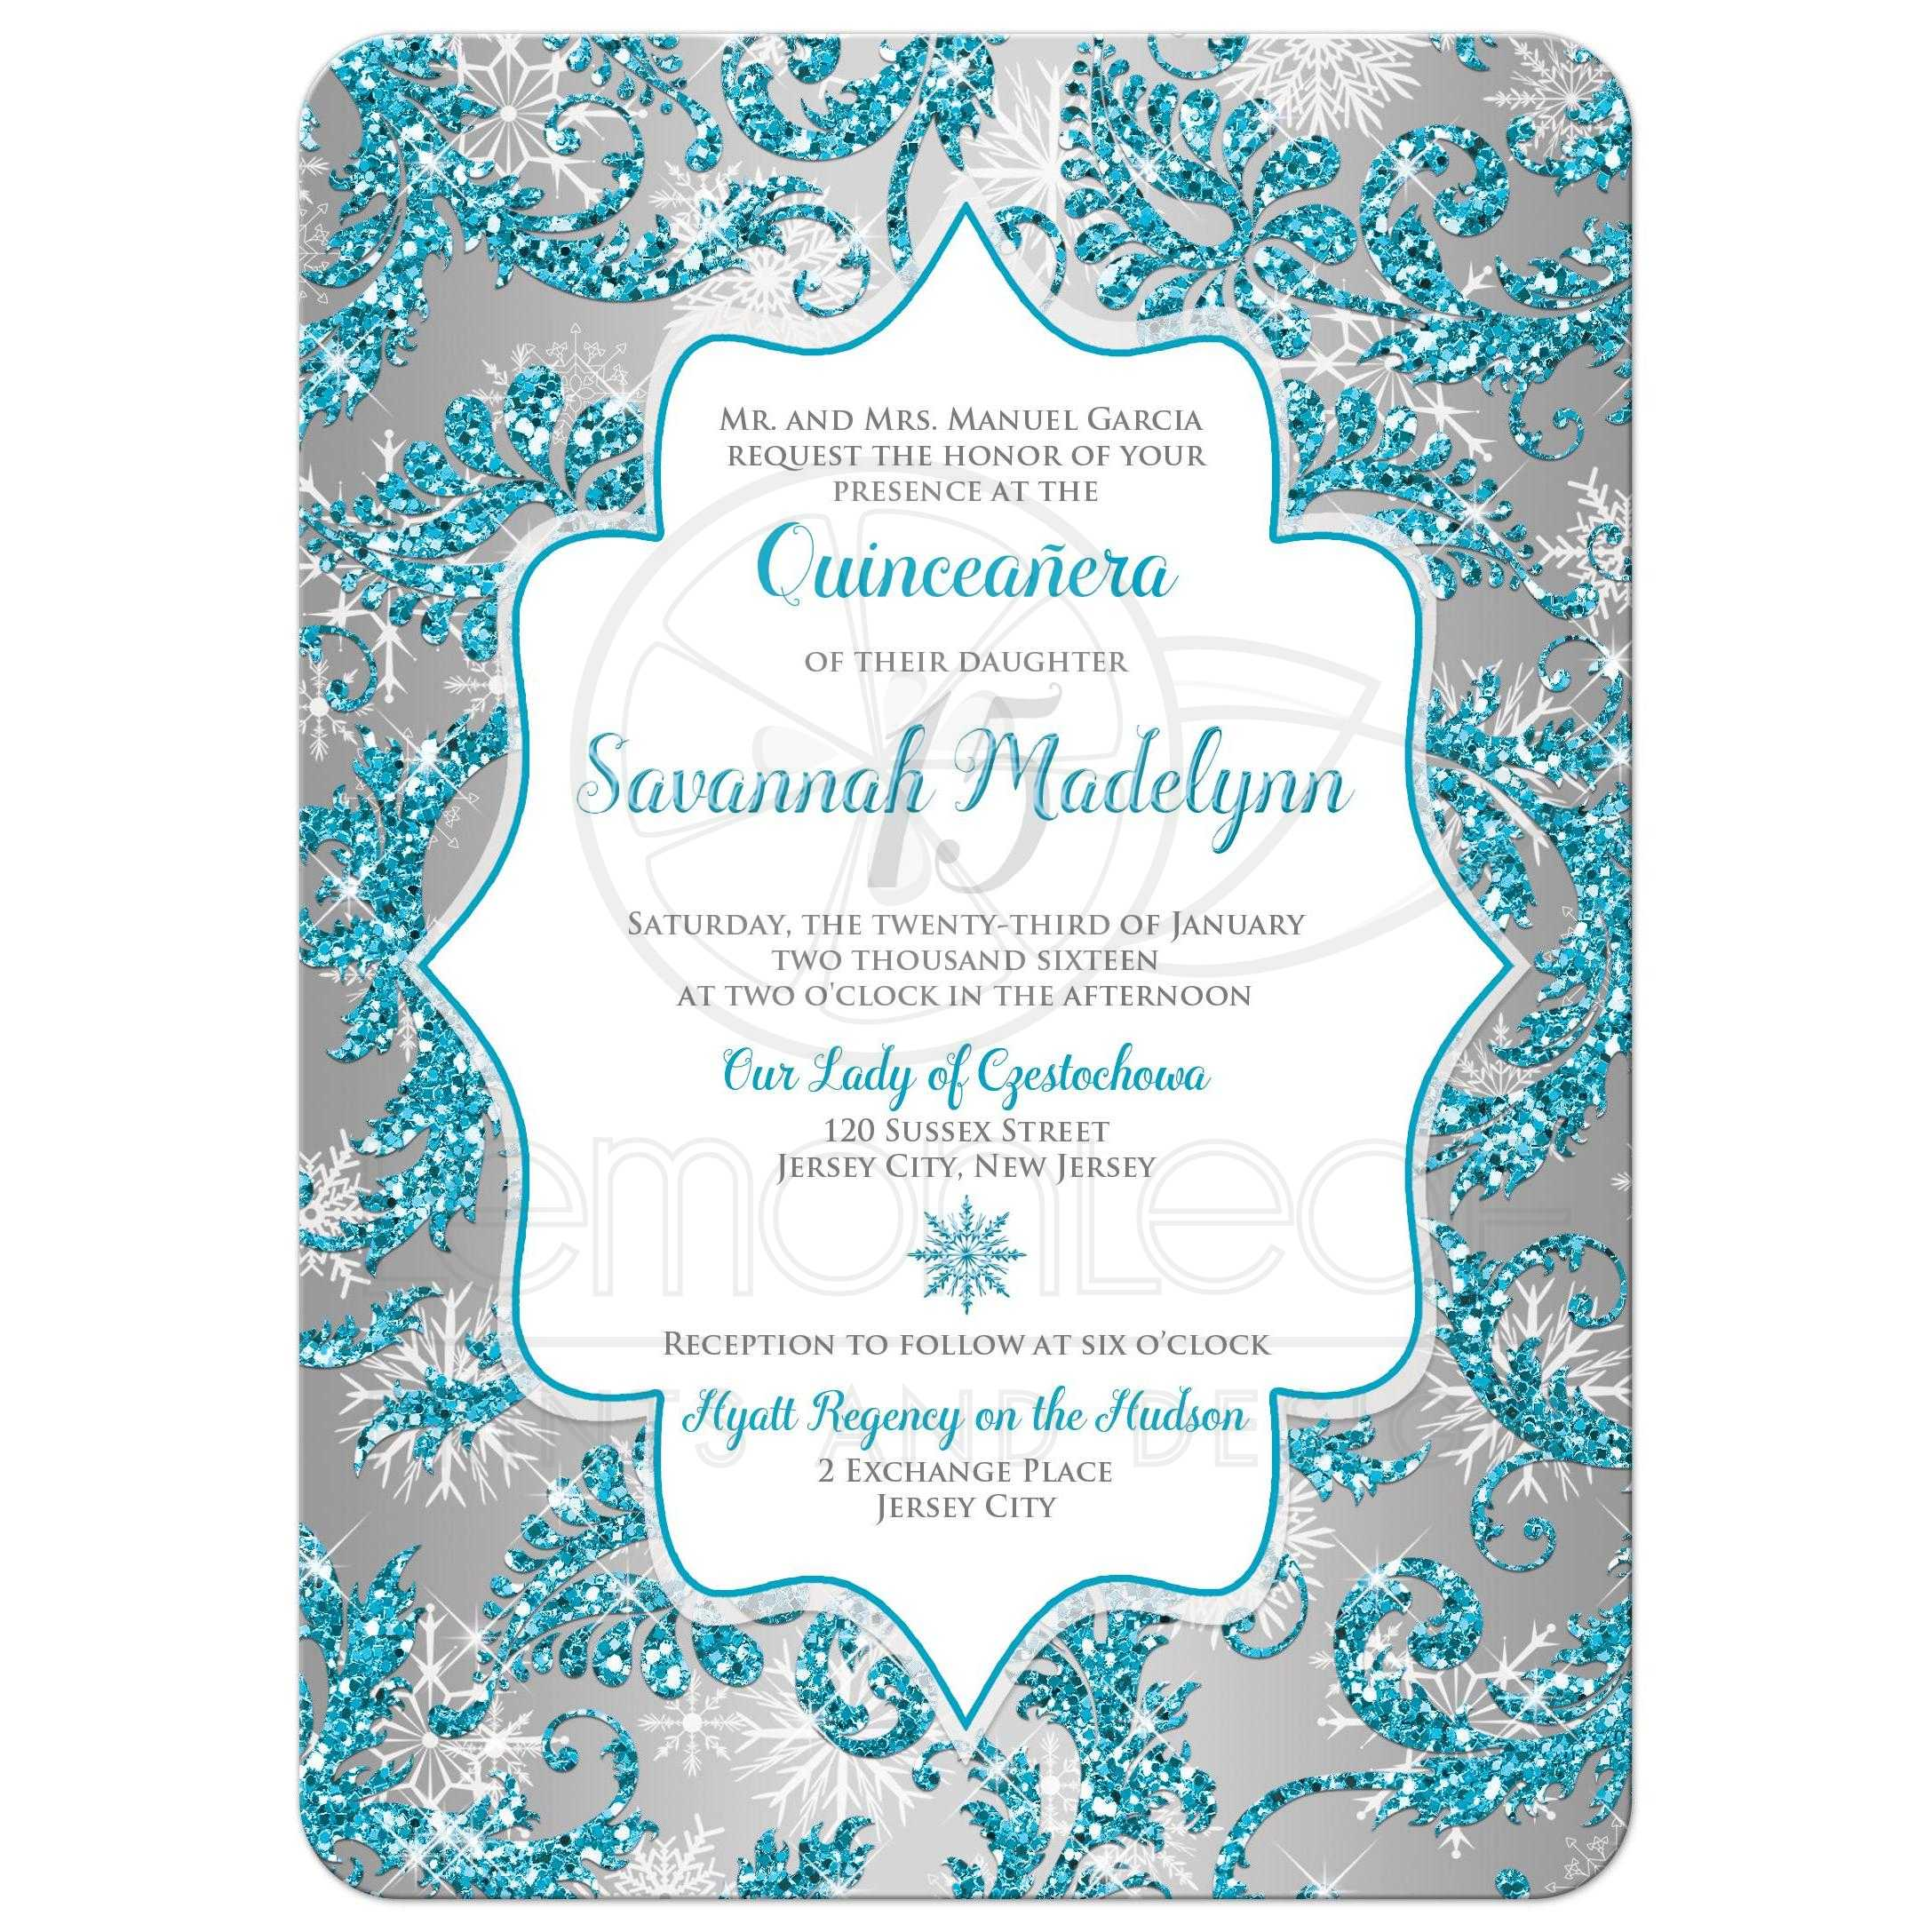 quinceañera invitation   winter wonderland turquoise, silver faux, Party invitations